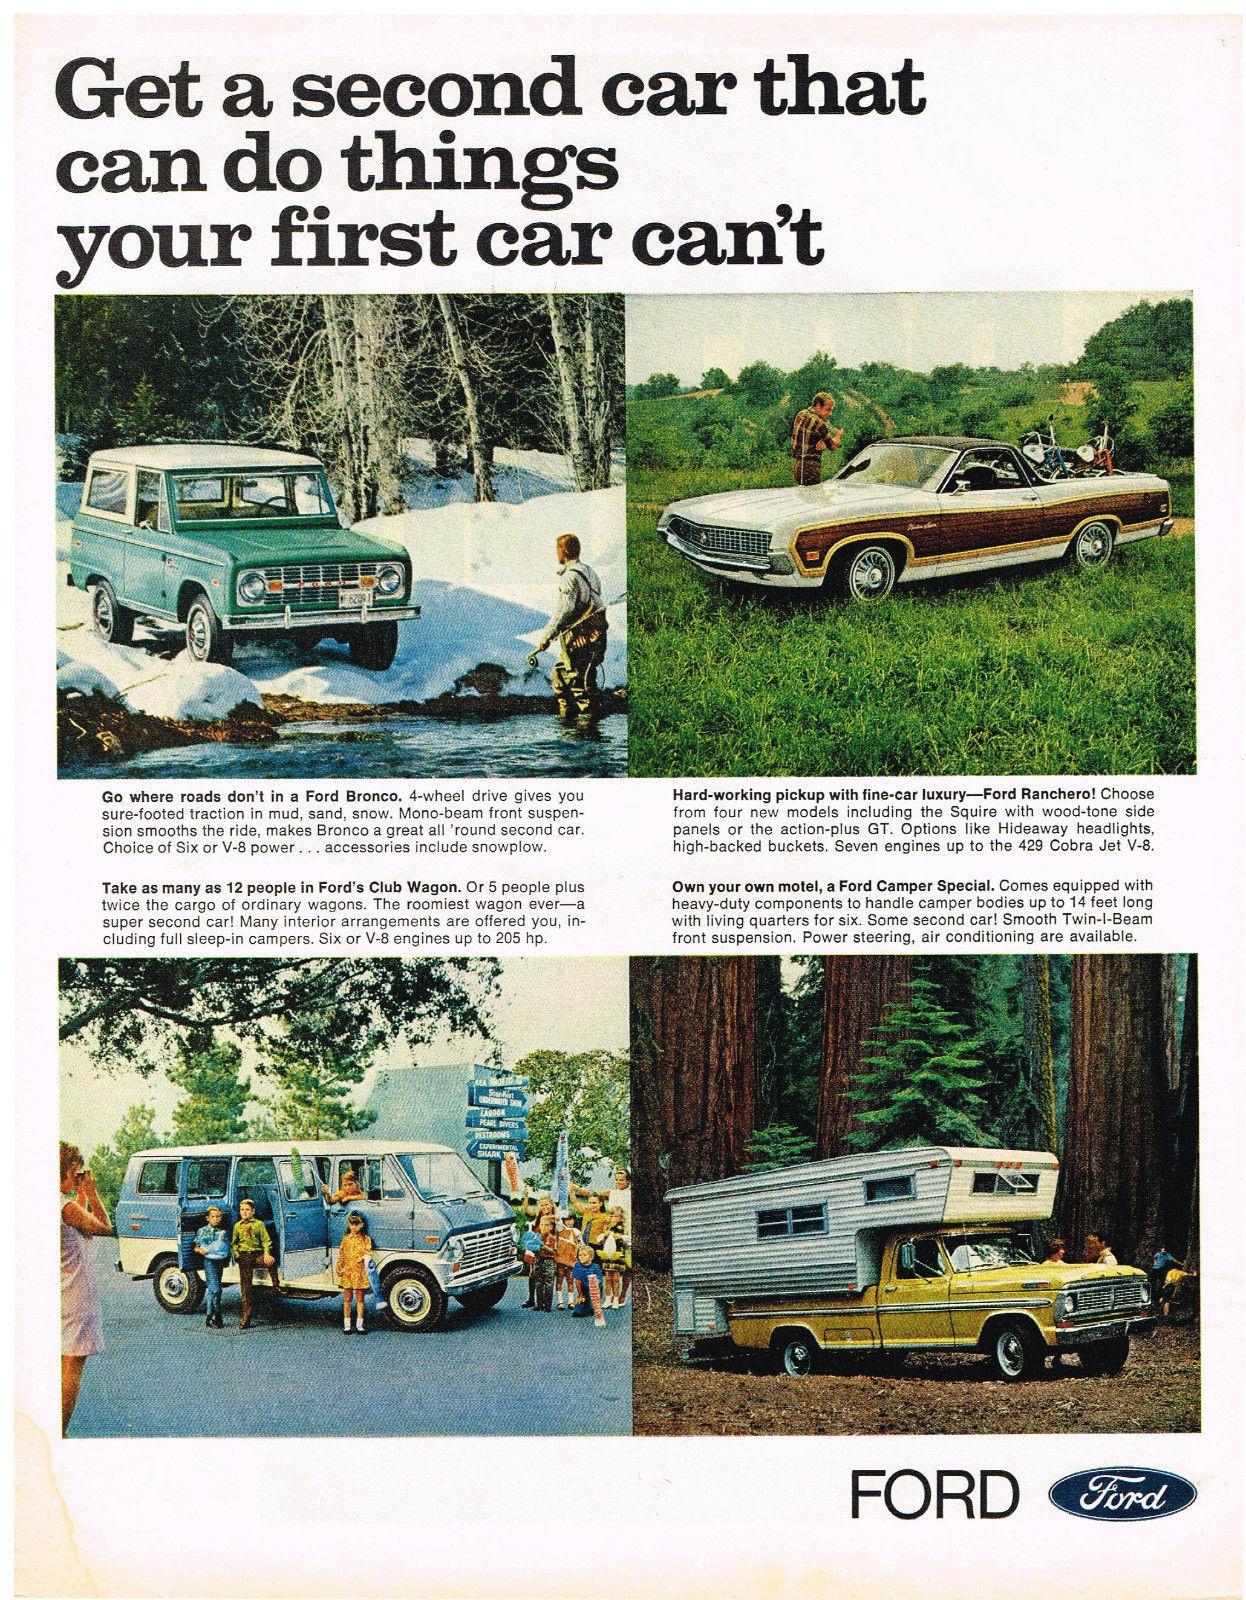 Vintage 1969 Magazine Ad Ford Vehicles Large Hard Working Versatile Practical - $5.93